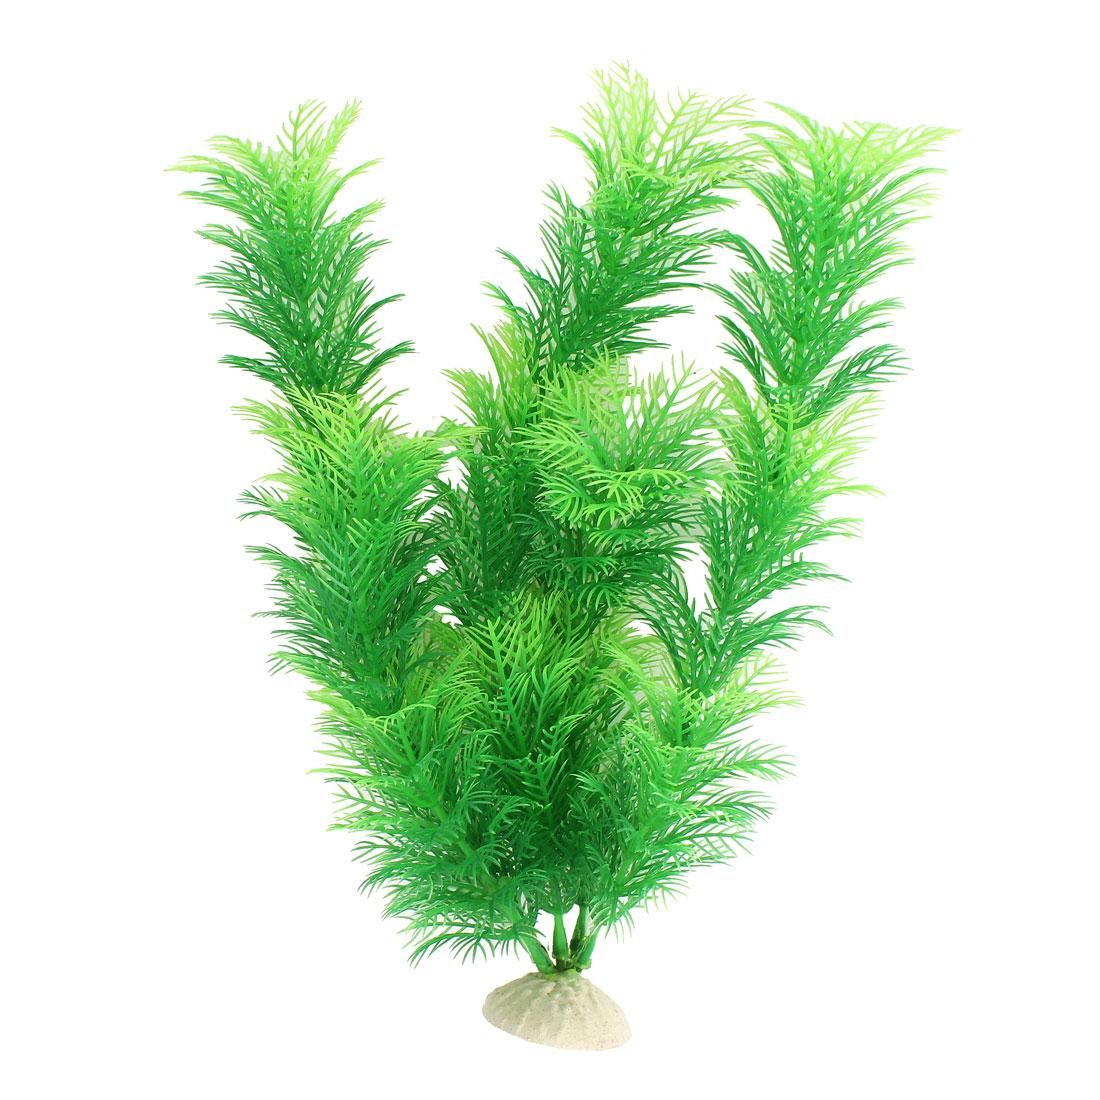 "Green 12.2"" Height Fish Tank Plastic Simulation Aquatic Plant Ornament Decor"